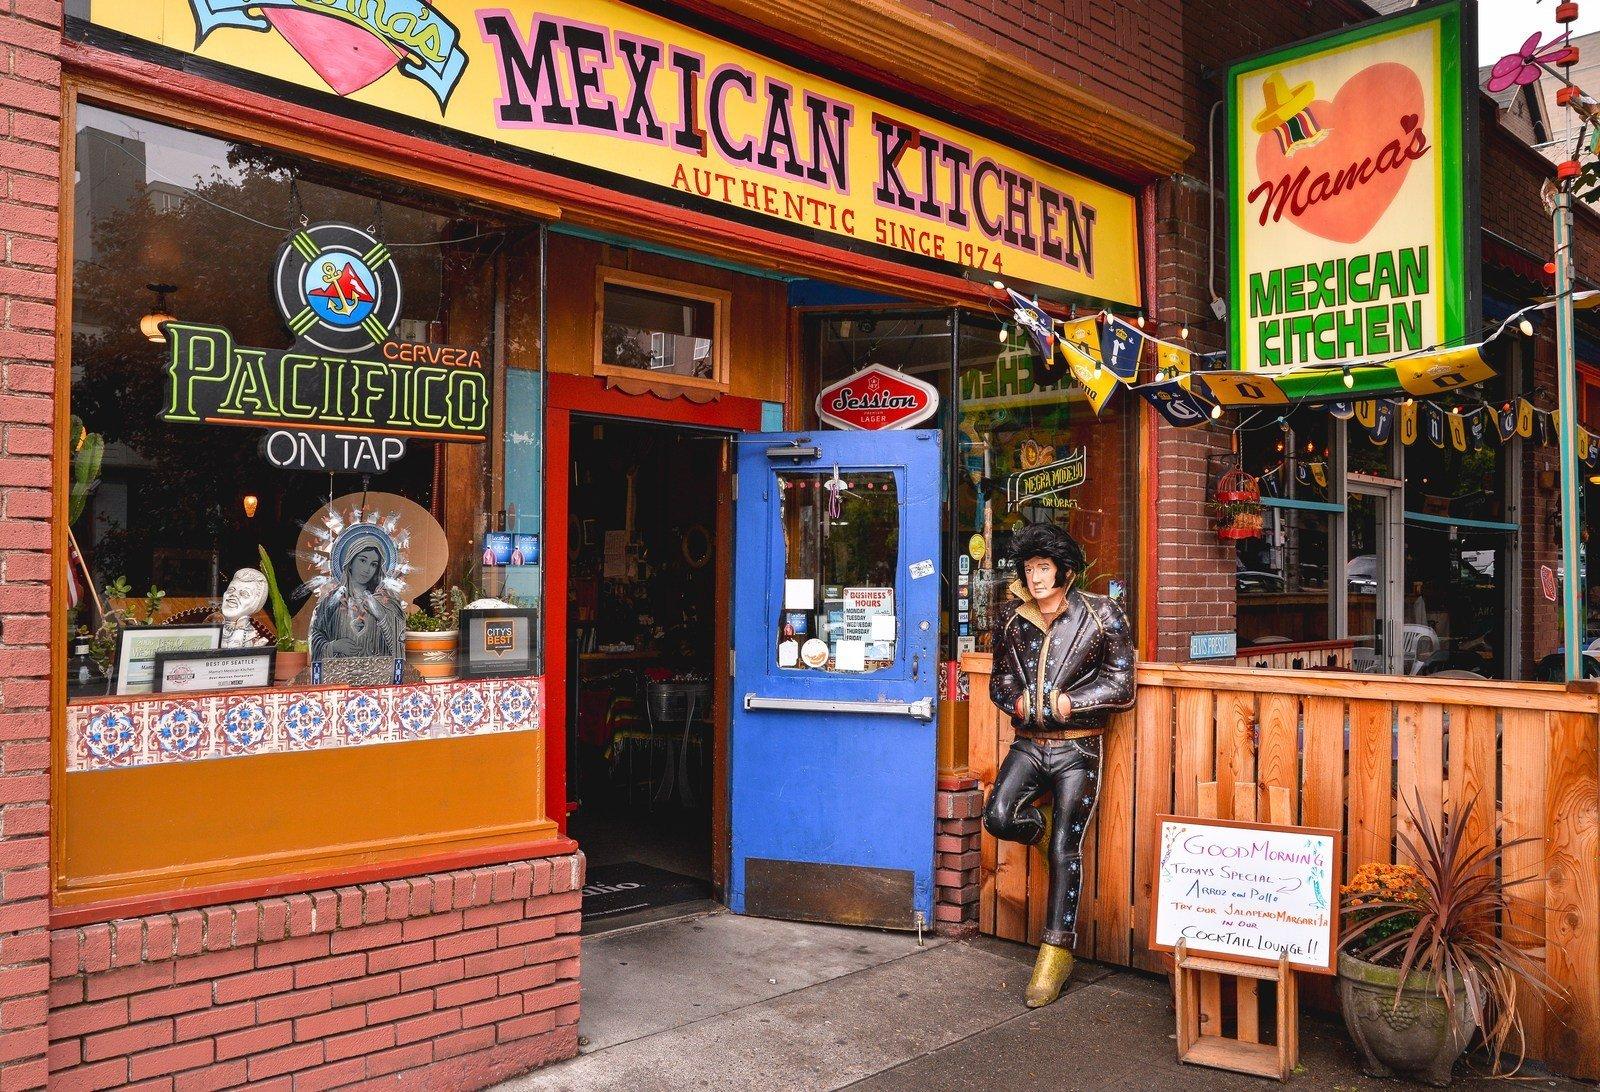 Mama 39 s mexican kitchen seattle aux etats unis for Mama s italian kitchen